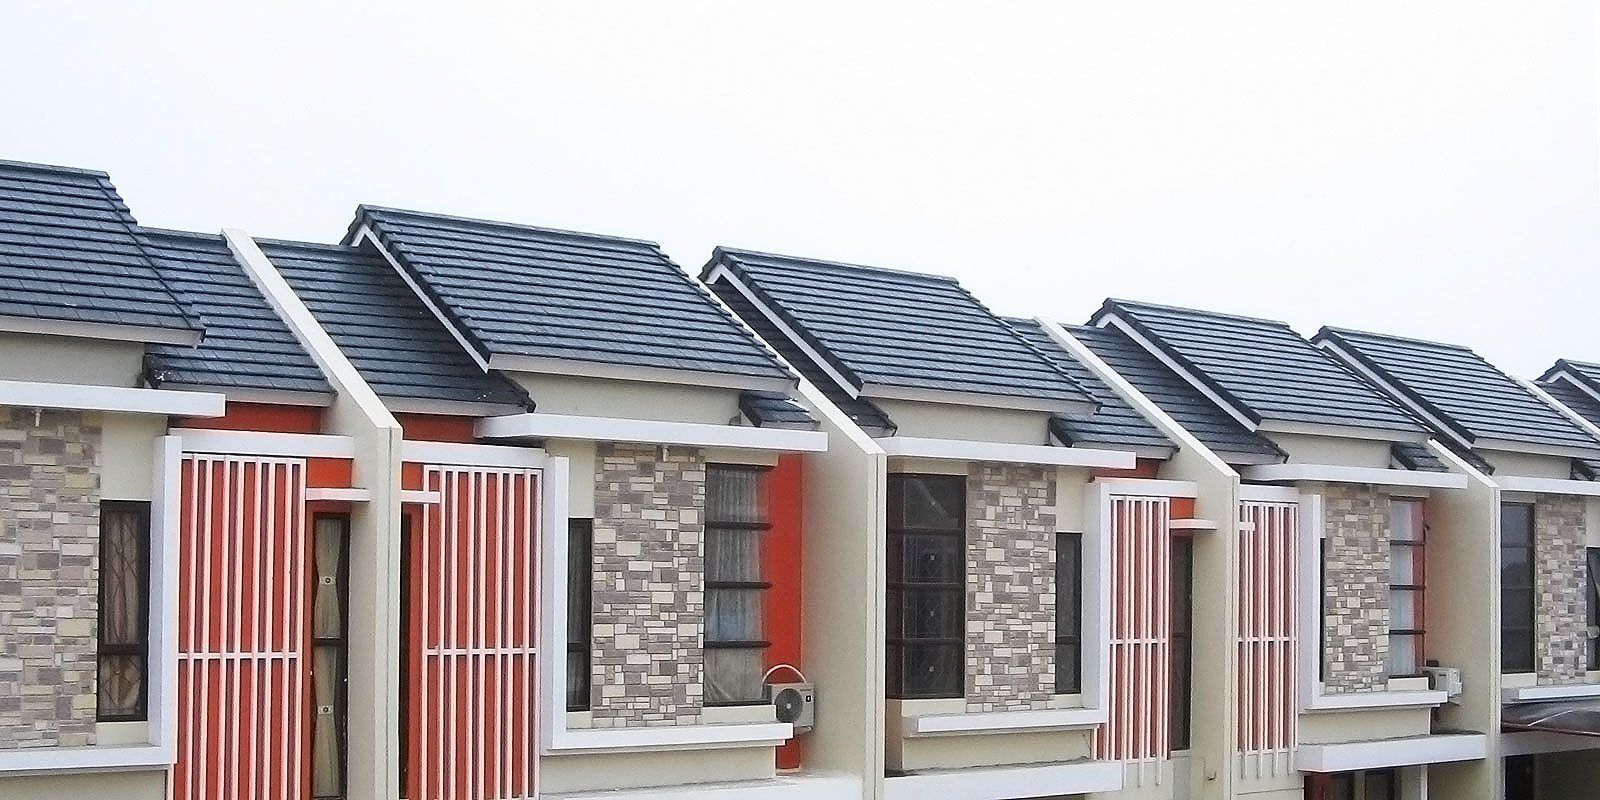 Bentuk Atap Rumah Minimalis 2 Lantai